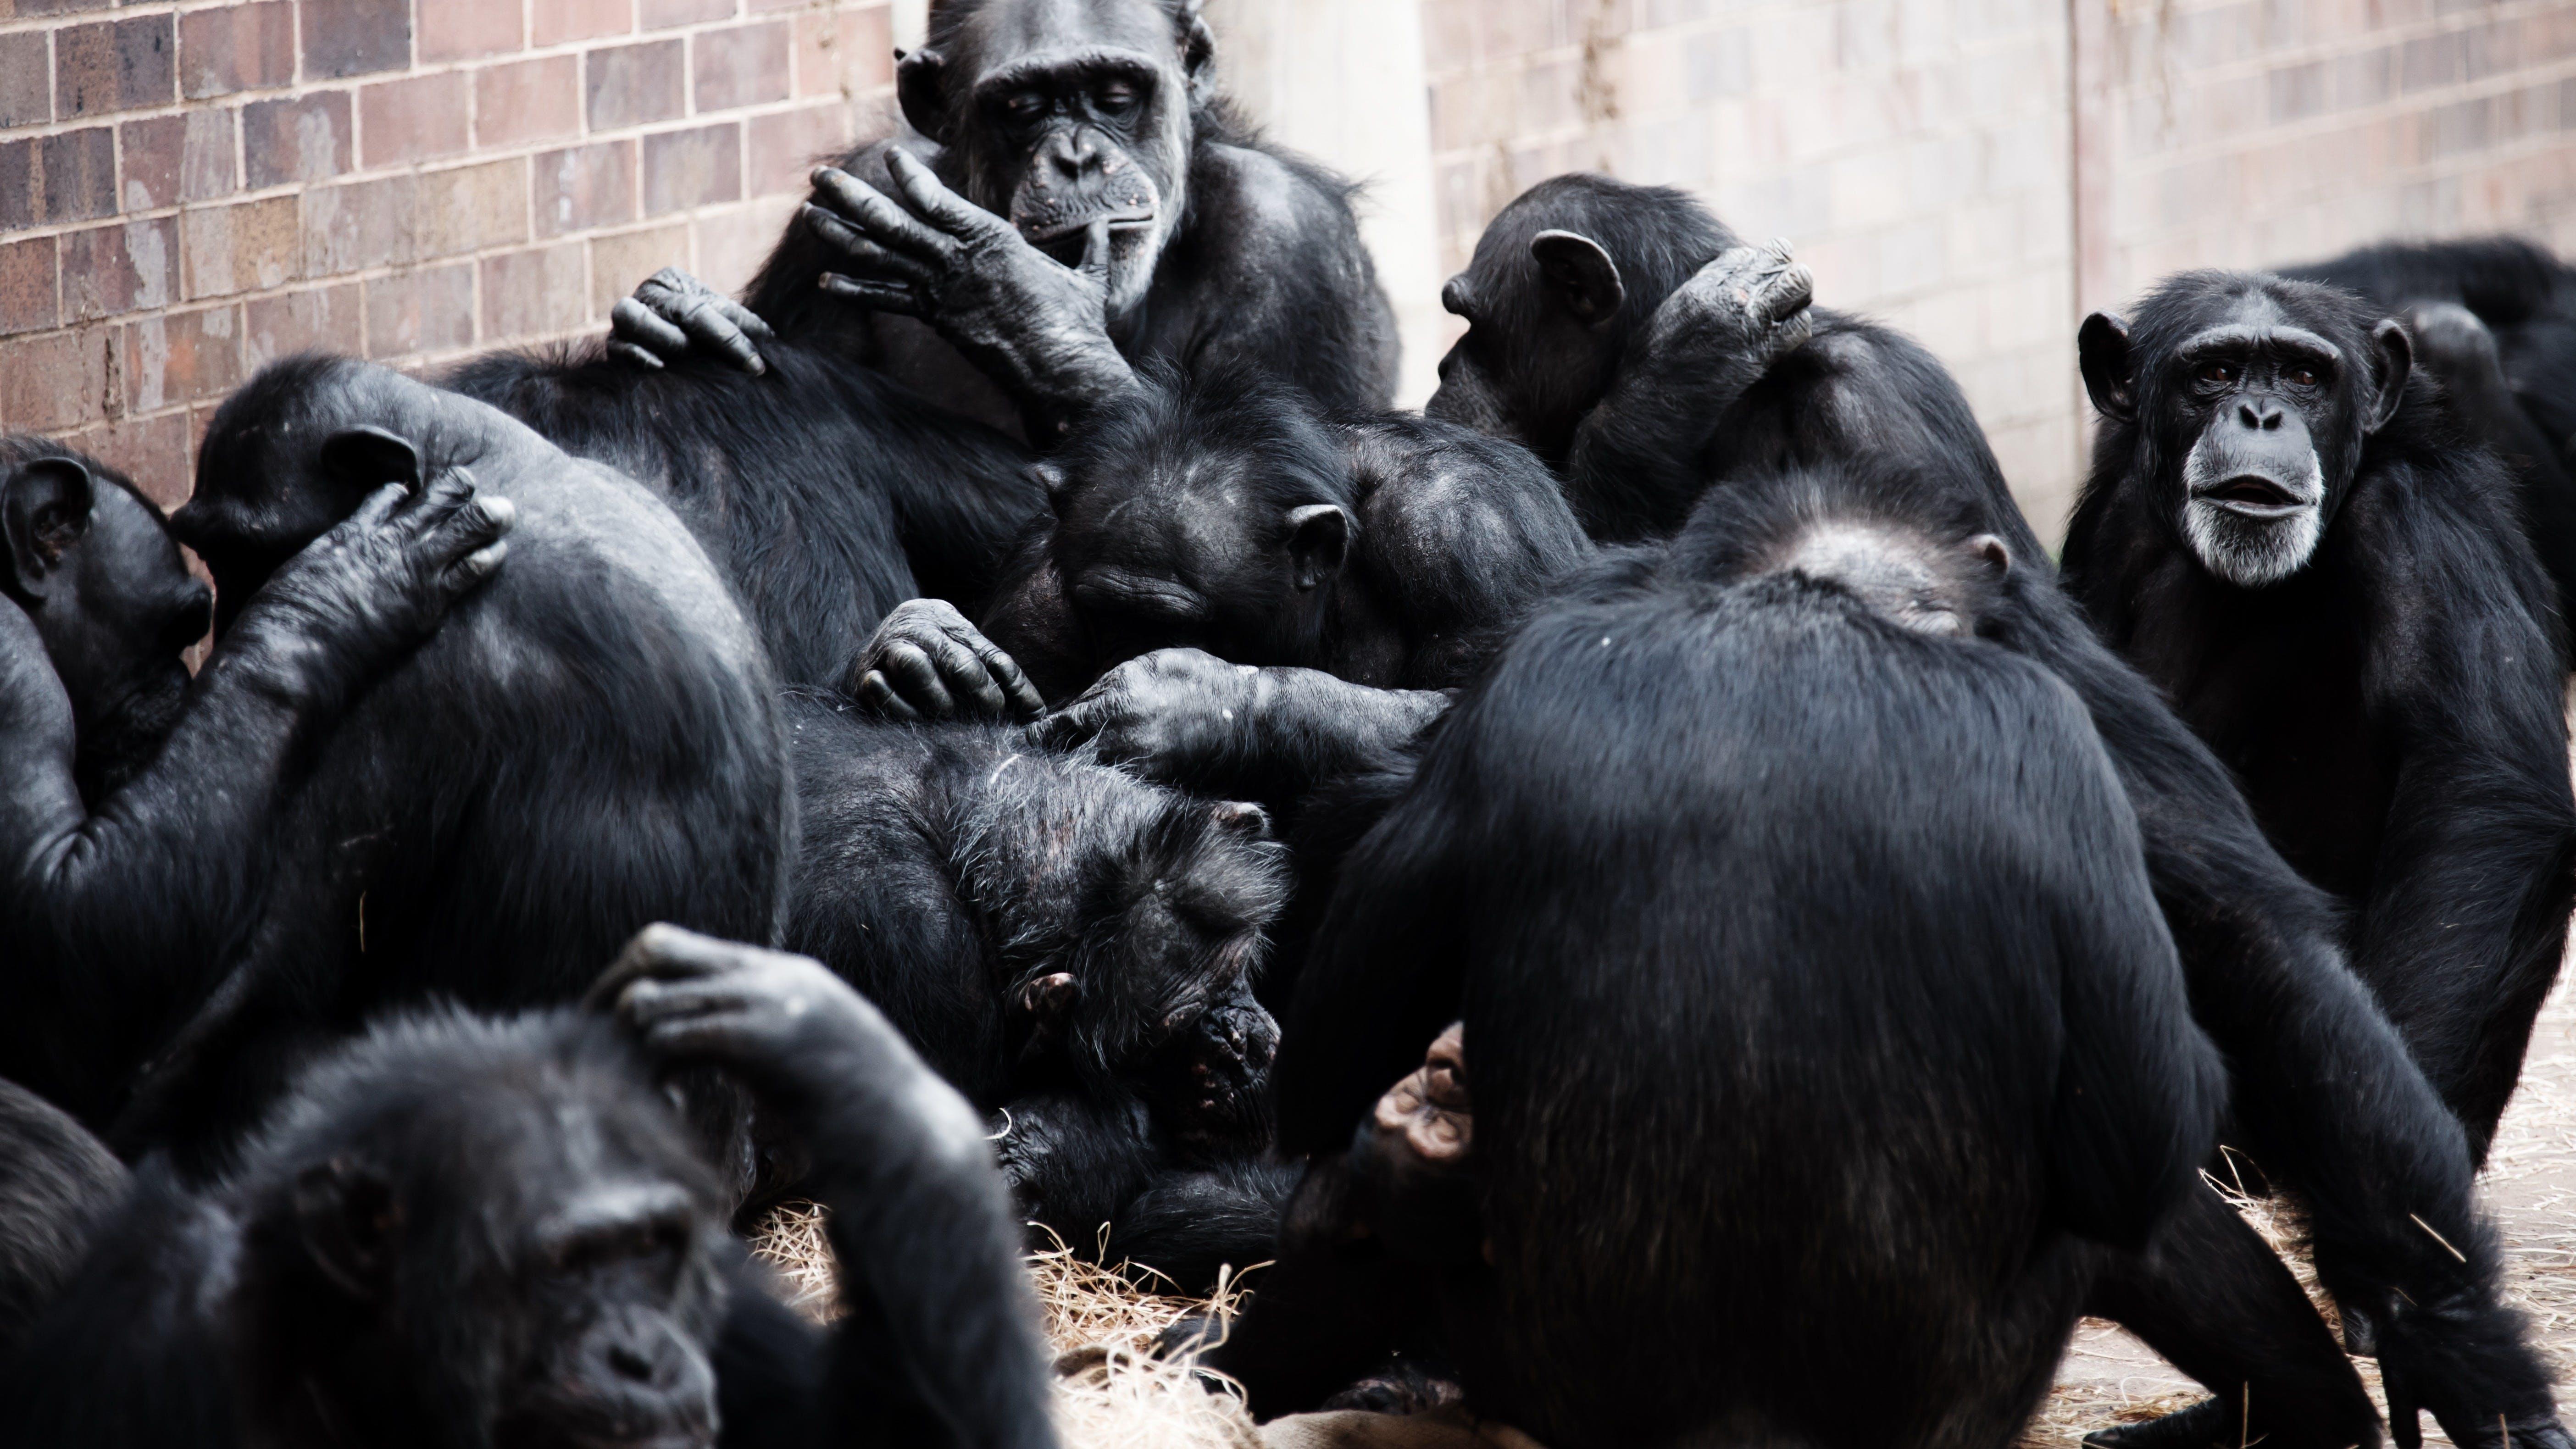 Free stock photo of animal, playing, monkeys, zoo